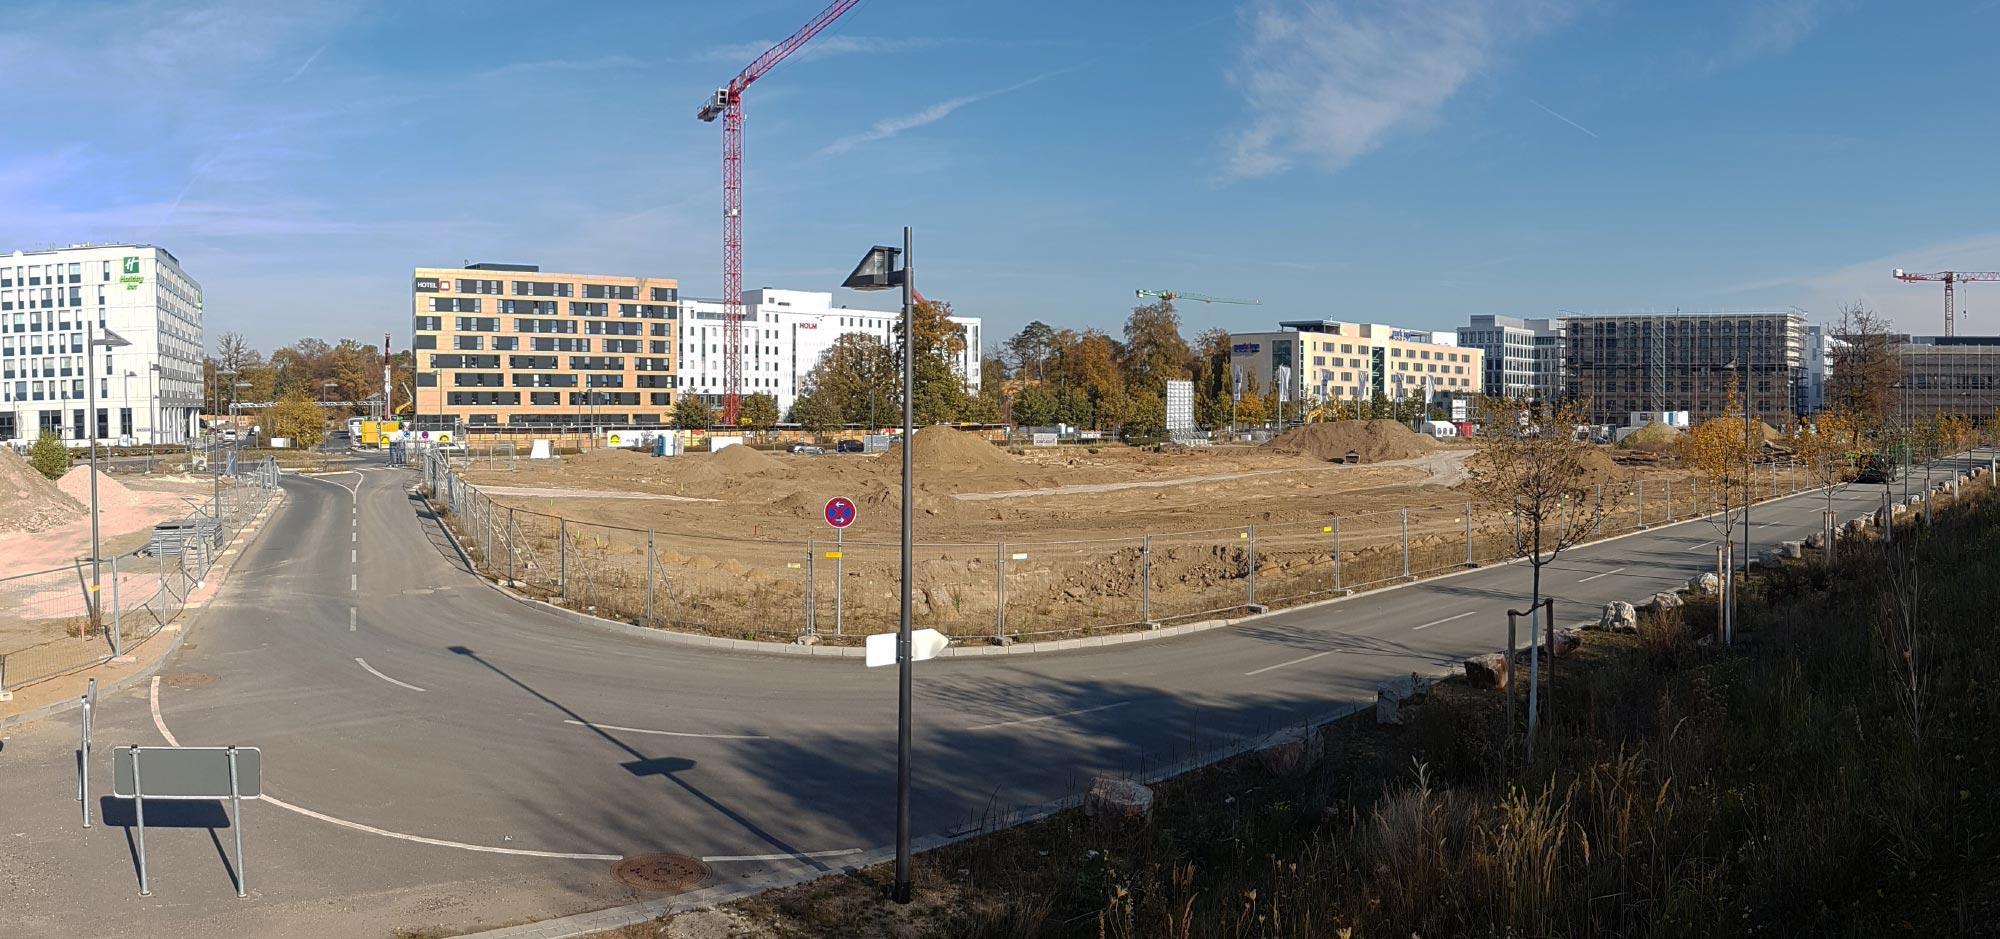 Gateway Gardens - real estate development area in Frankfurt - office district at Frankfurt Airport